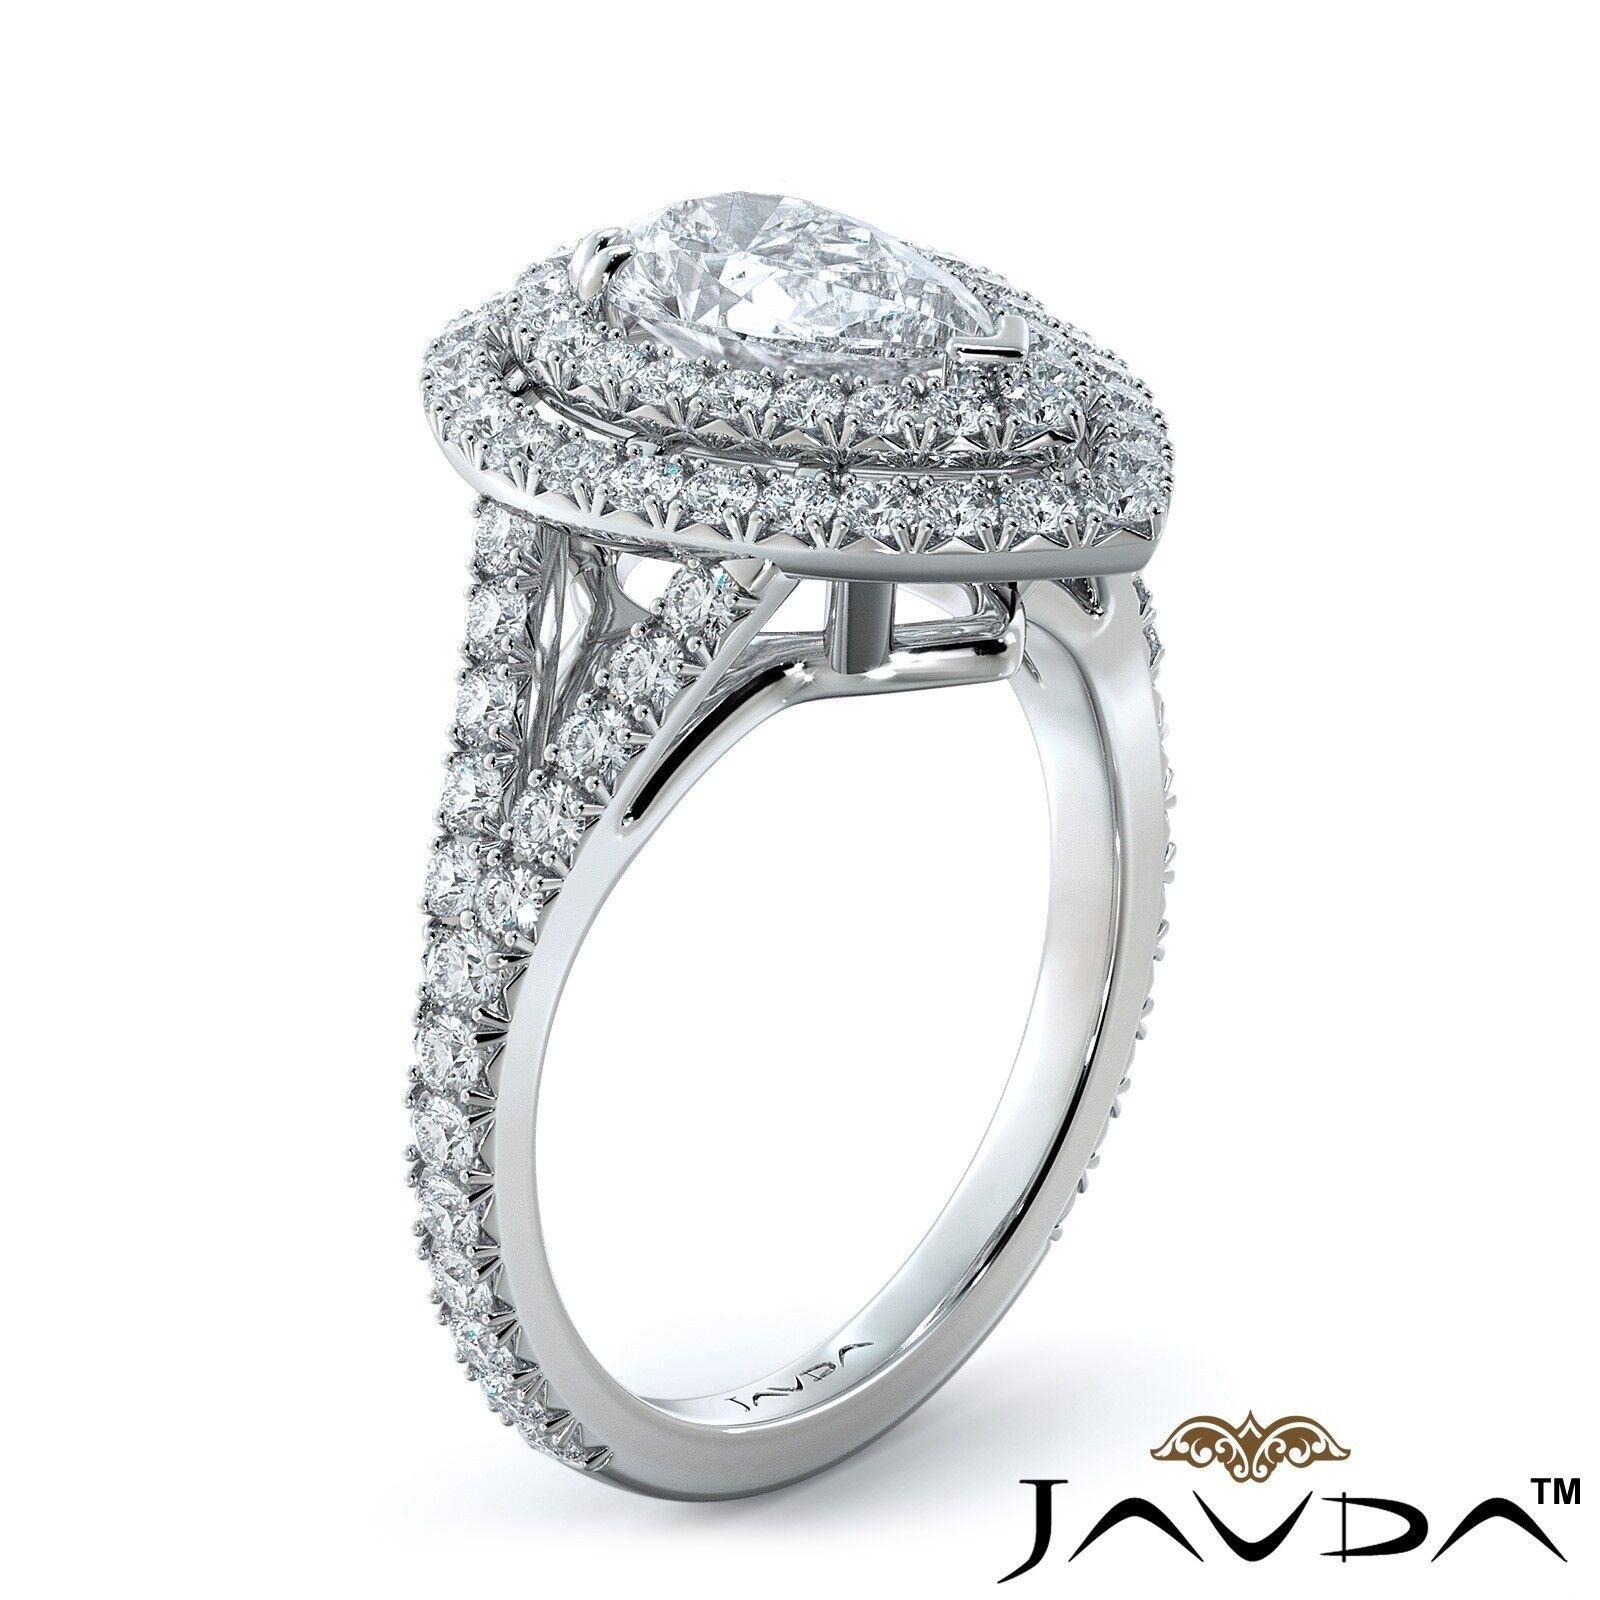 2.12ct Double Halo Split Shank Pear Diamond Engagement Ring GIA E-SI1 White Gold 1